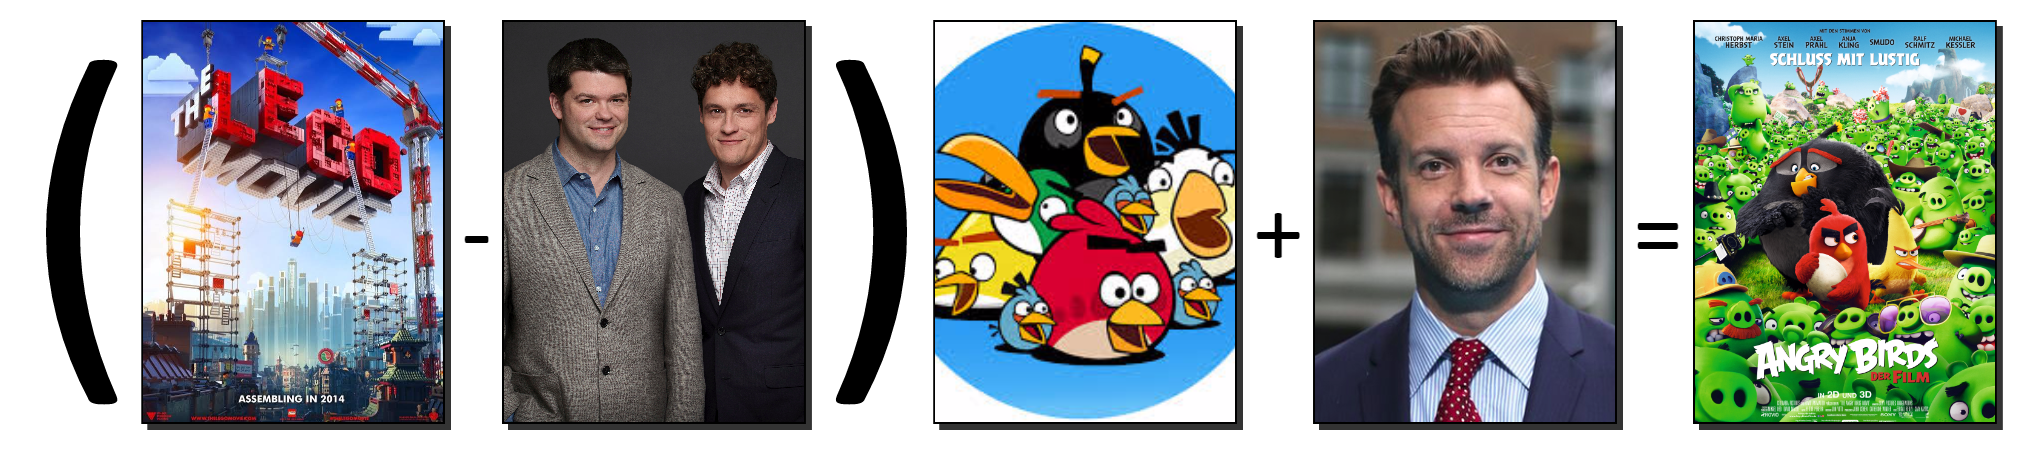 Angry Birds Moviequation